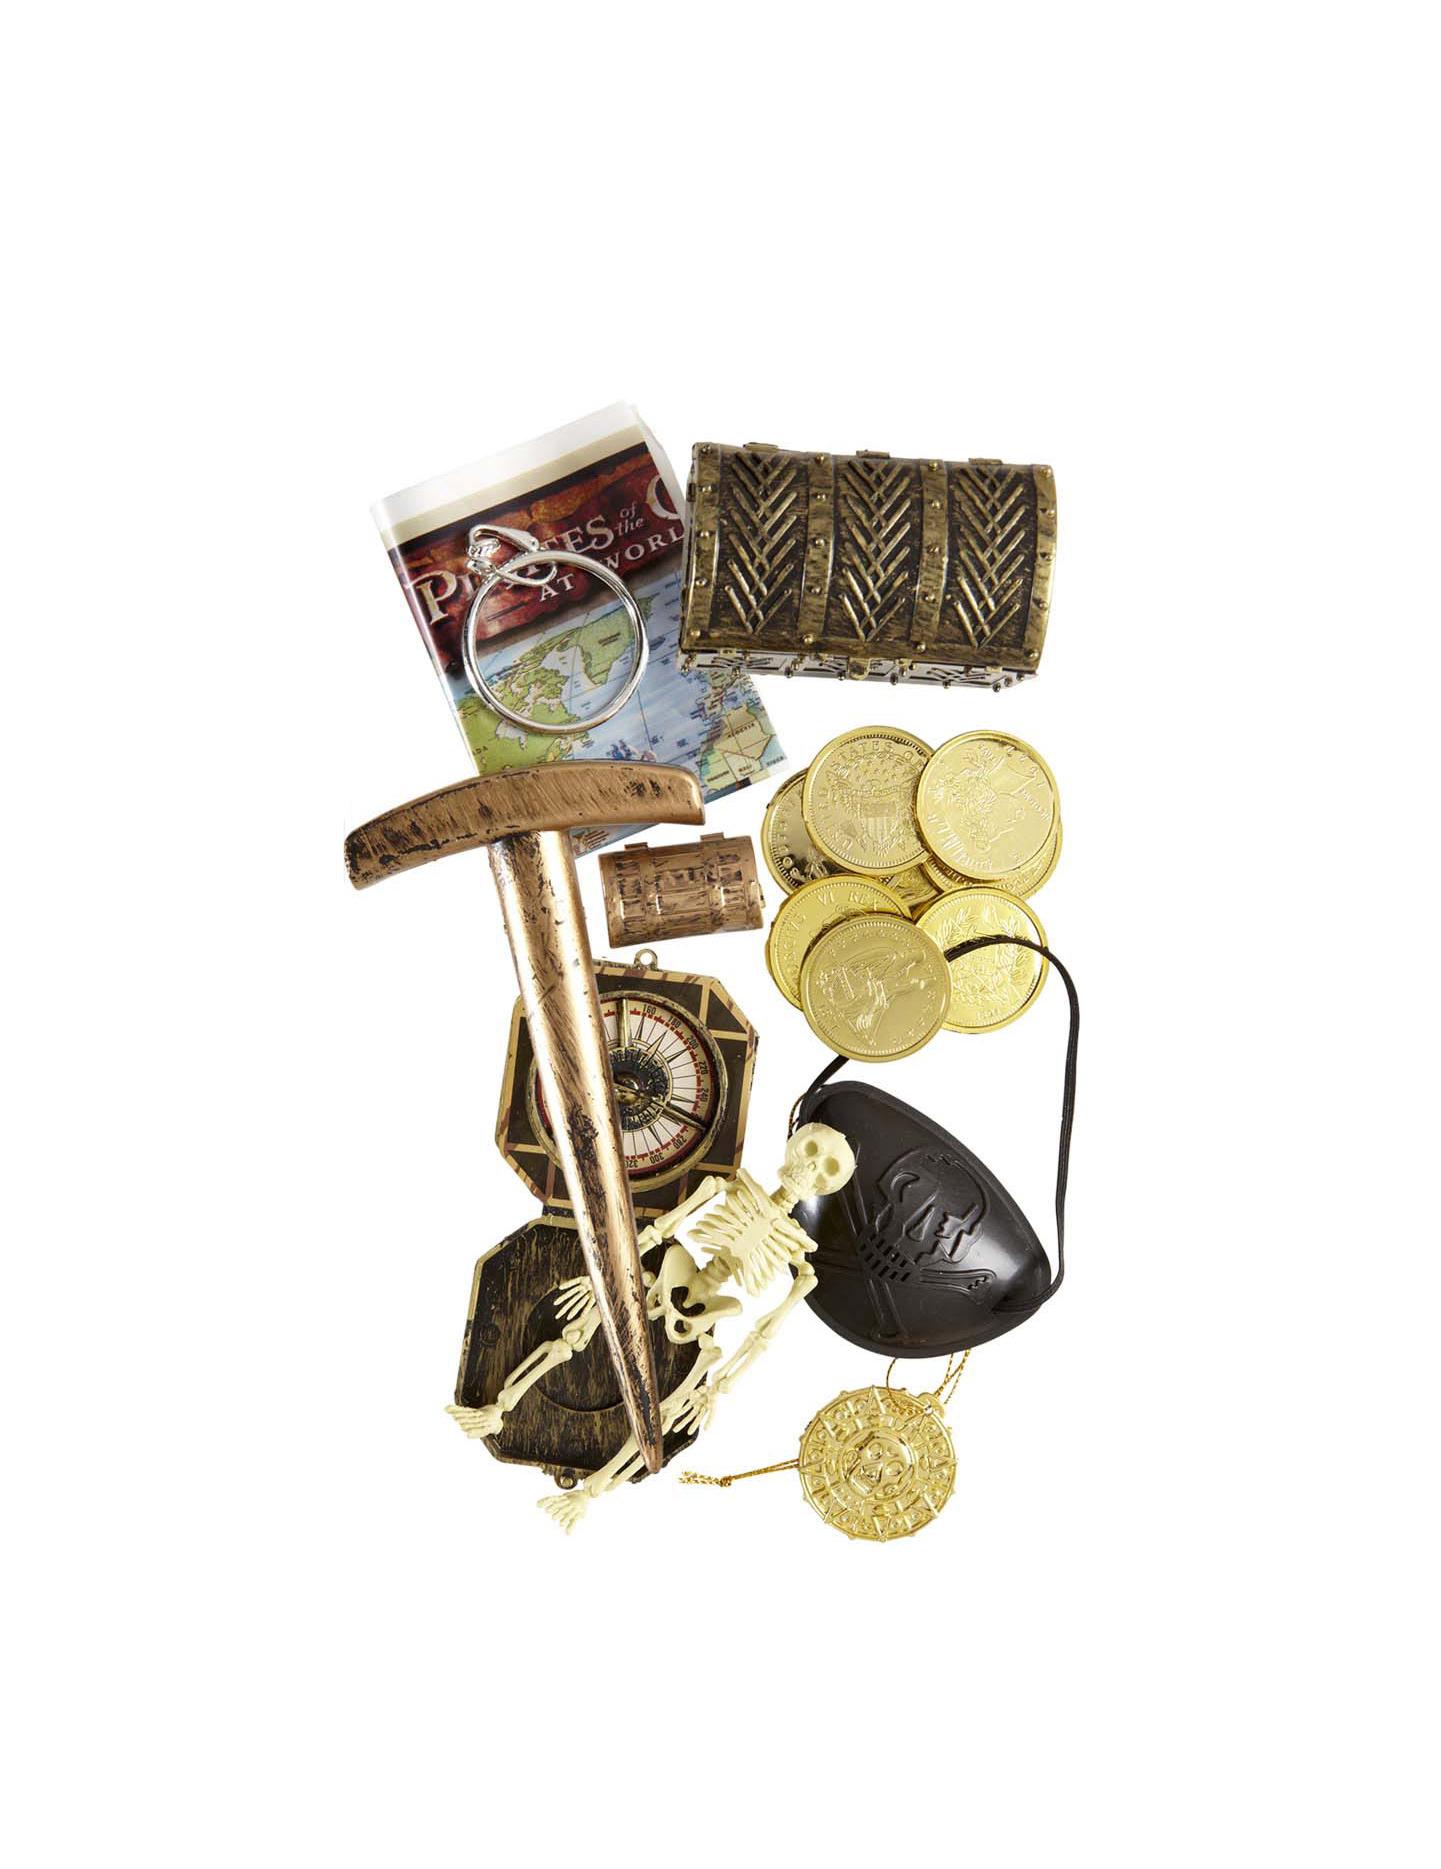 fd0abf7baa2 Kit accessoires pirate luxe   Deguise-toi